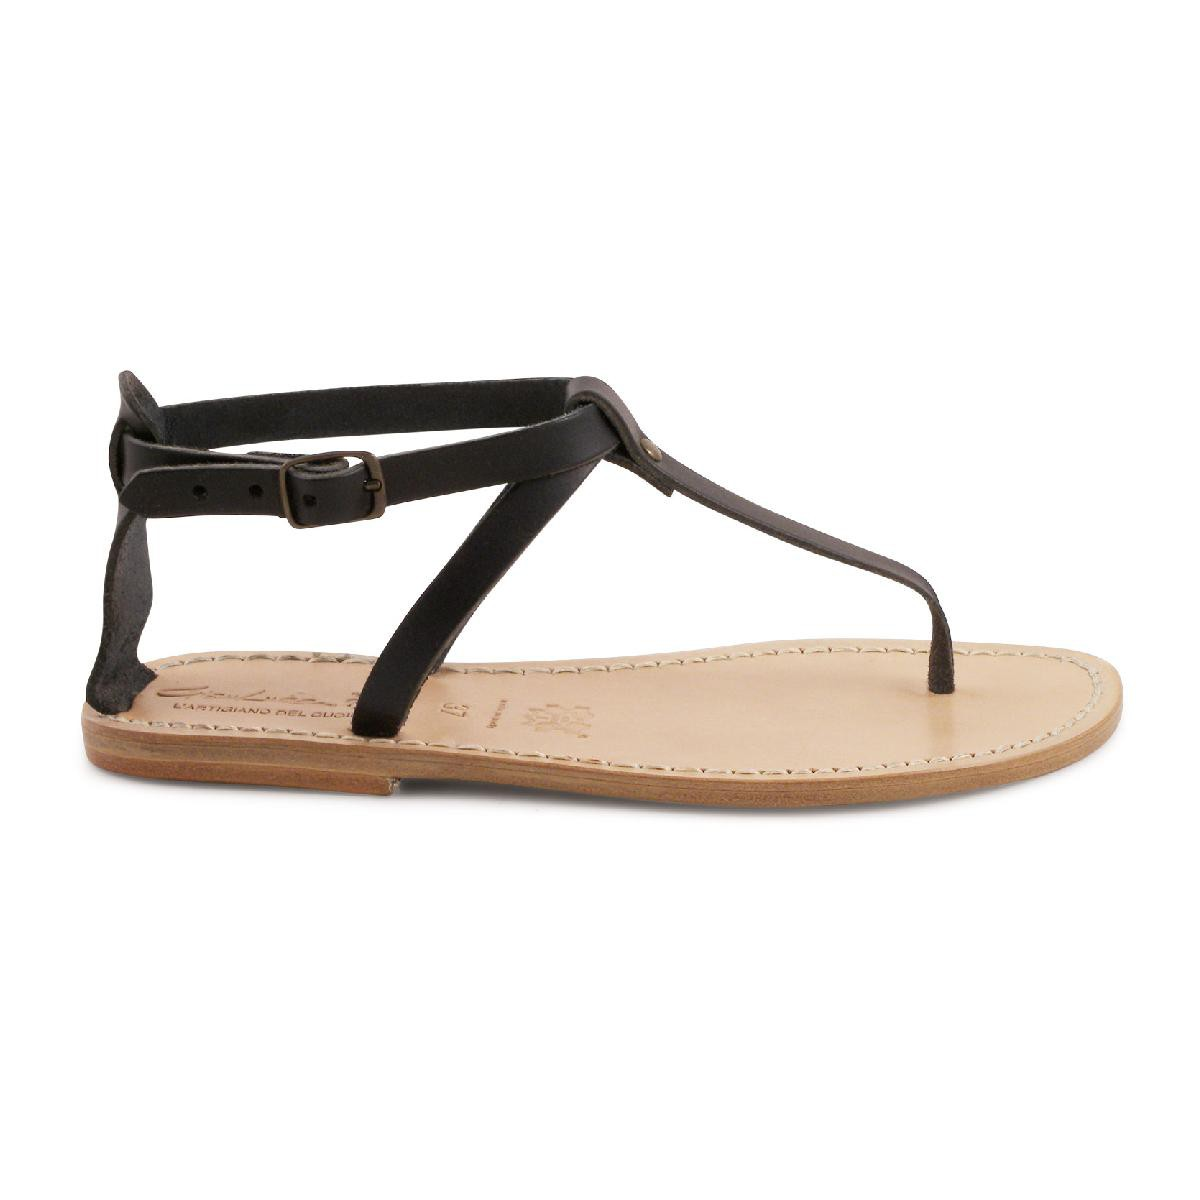 Original Car Shoe Women Brown Leather Glitter Flat Strappy Sandals  Italian Boutique